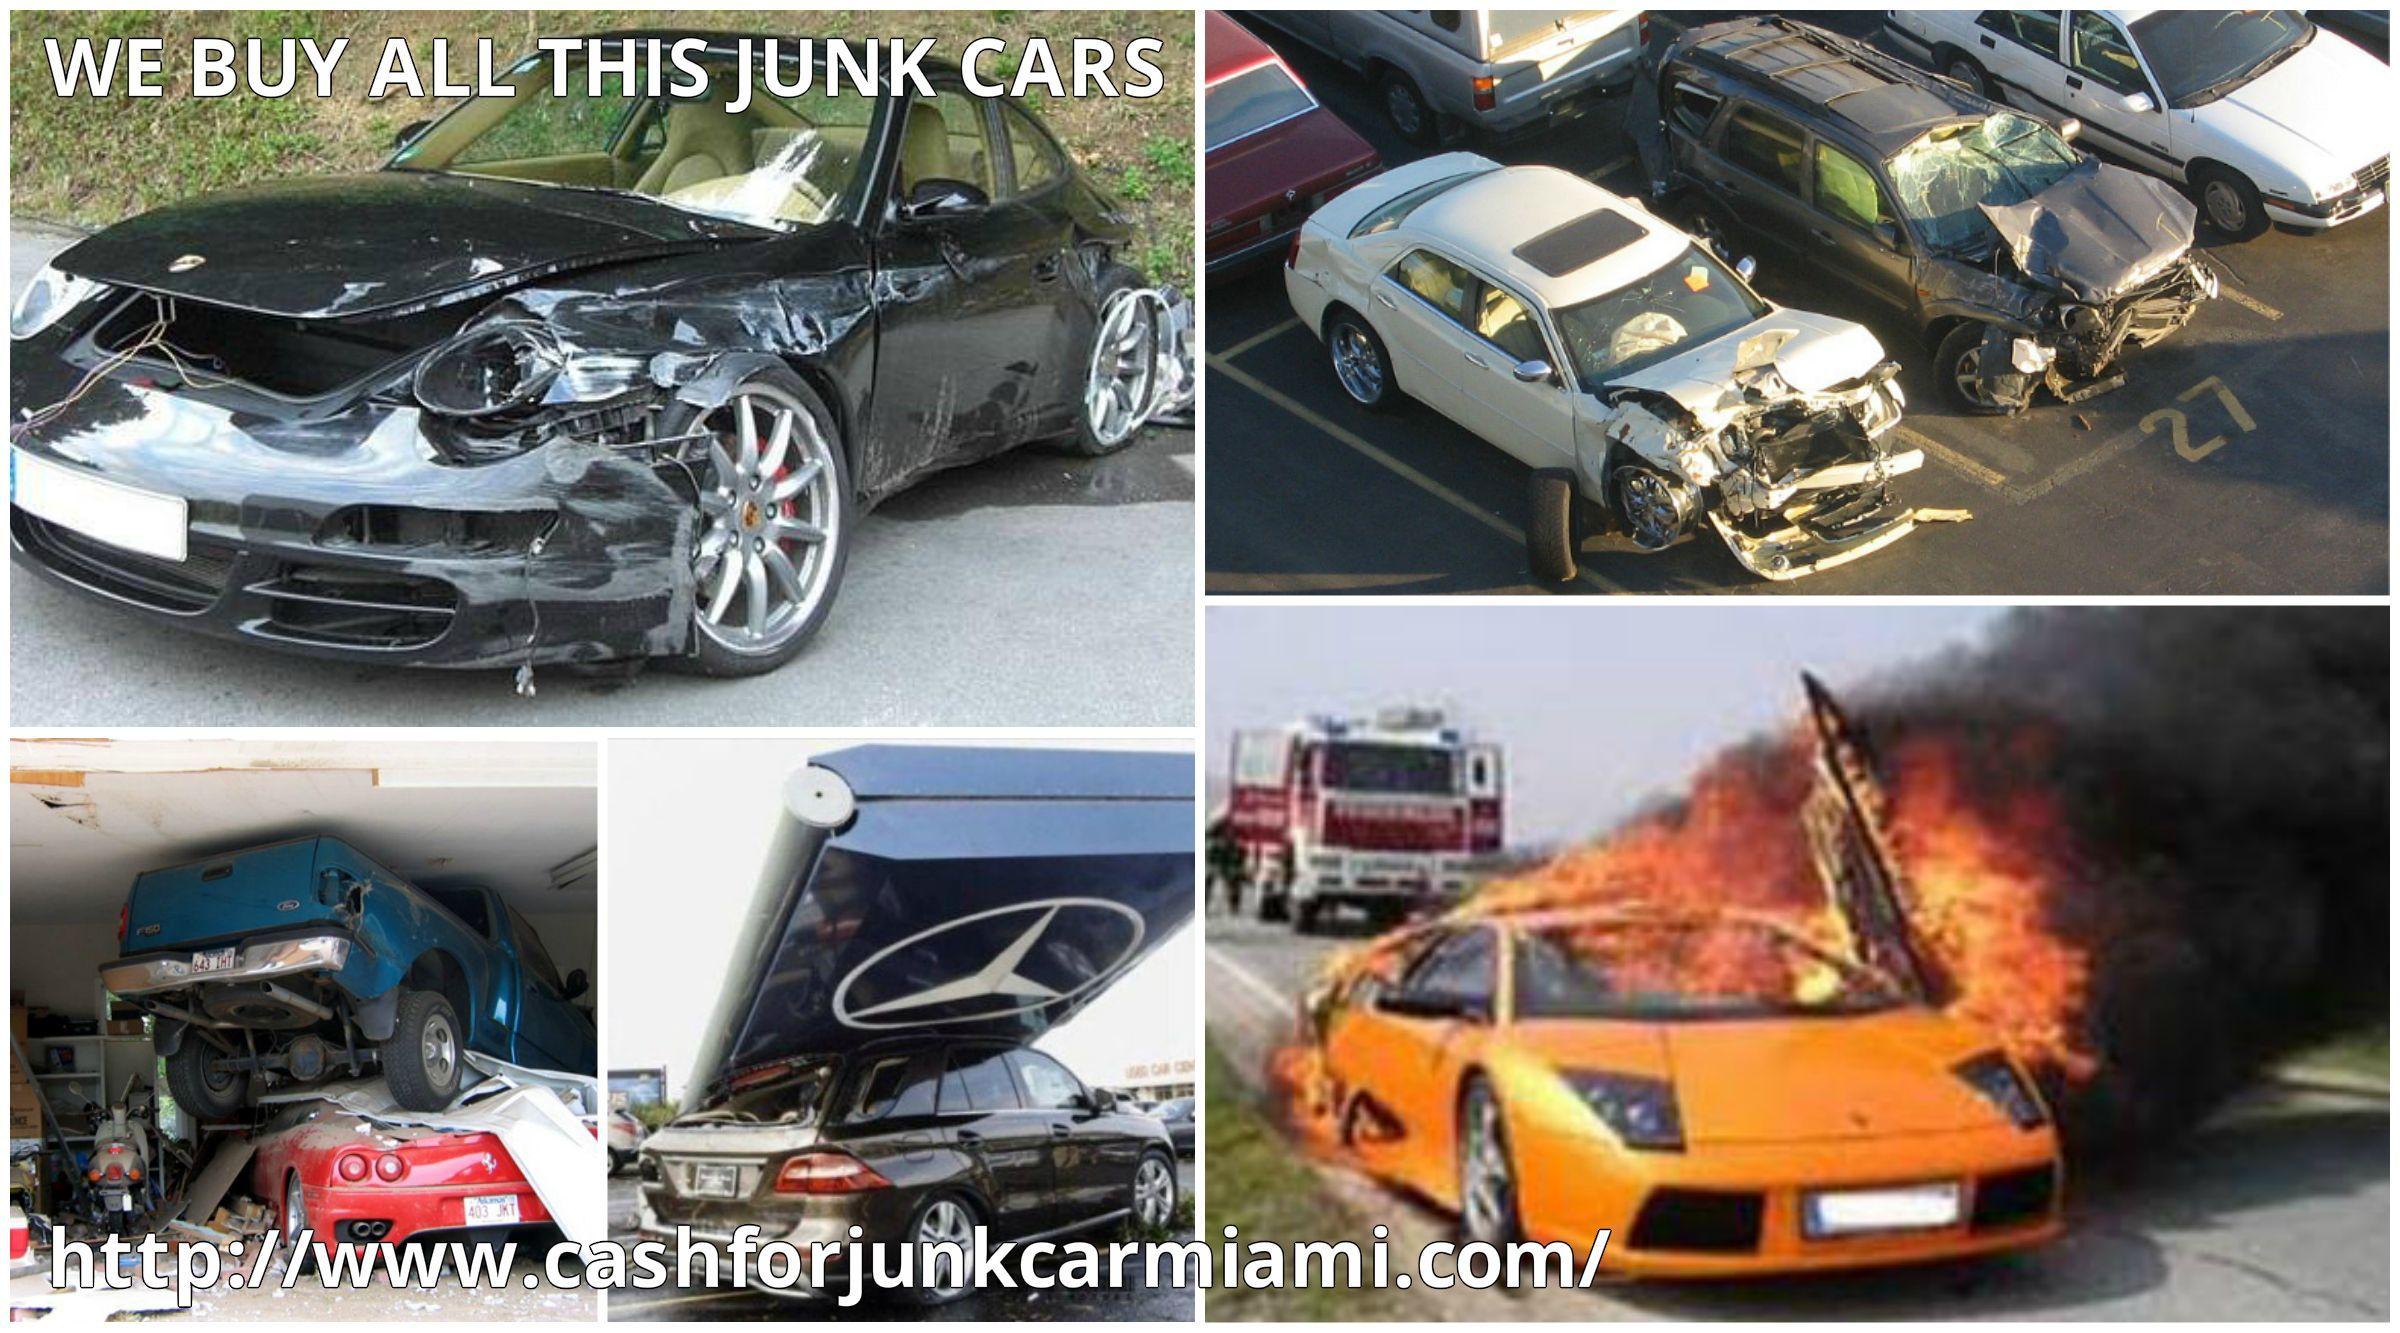 http://www.cashforjunkcarmiami.com/ Cash For Junk Car Miami provides ...